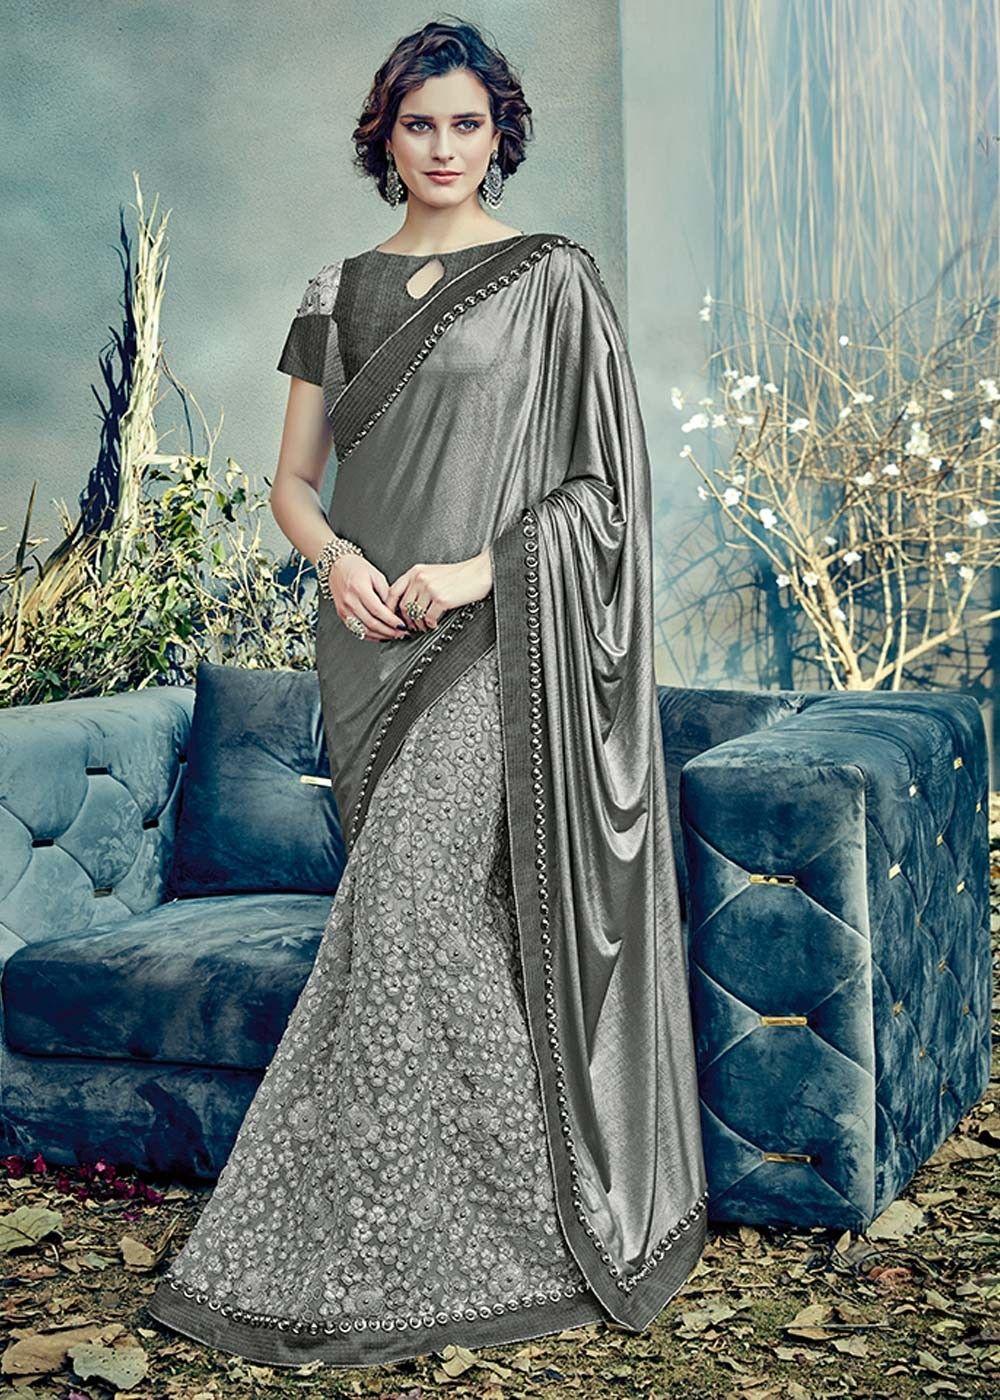 6aca94e7b1 Indian Latest Bridal Lehenga Saree Designs 2018-2019 | Saree n ...